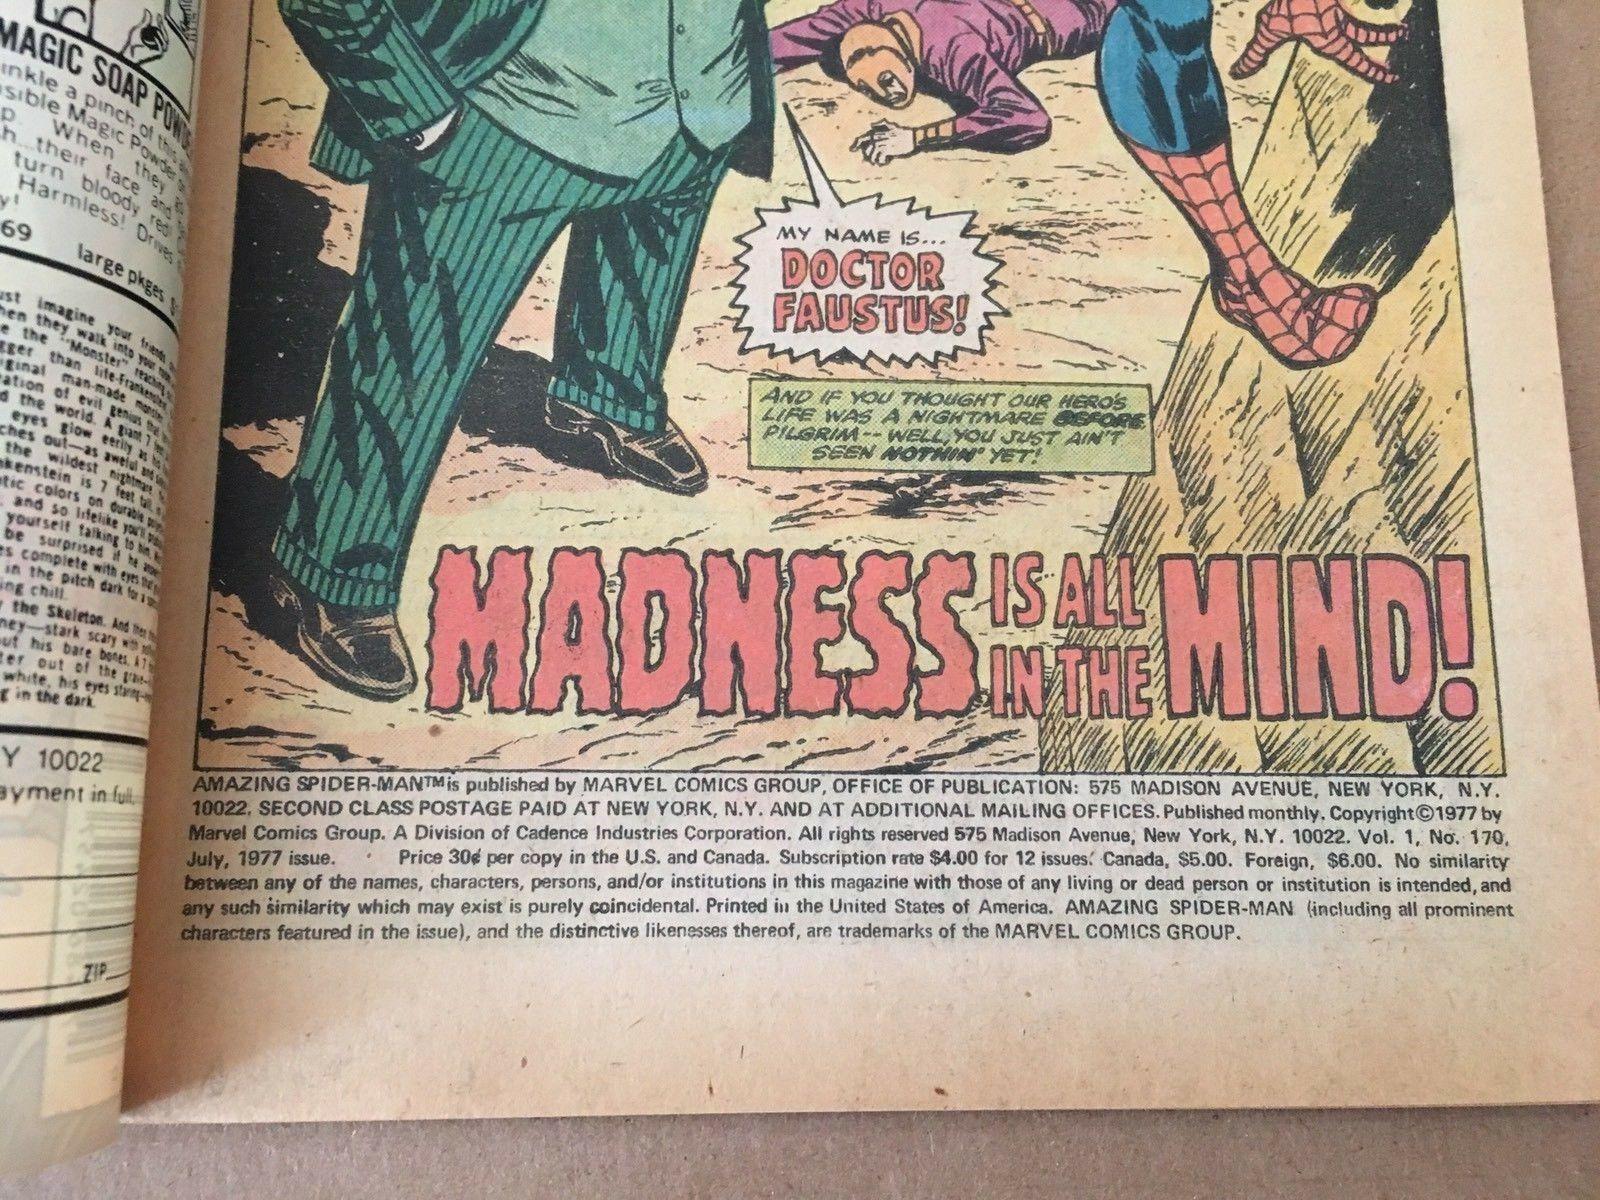 Amazing Spider-Man #170 Marvel Comic Book 1977 VF/VF+ Condition